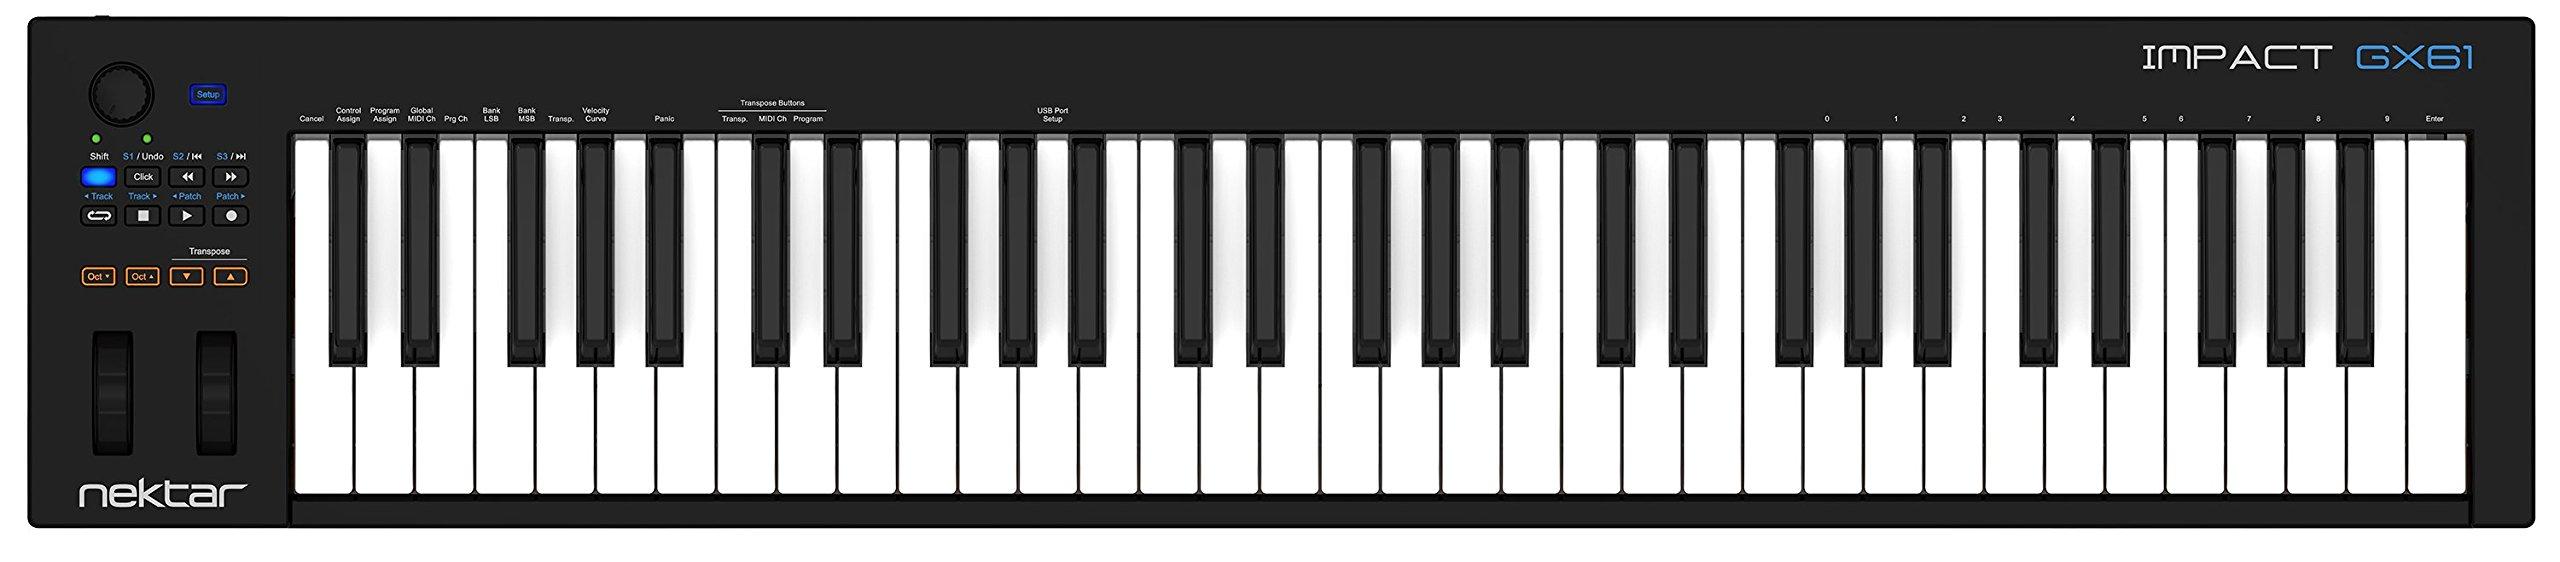 Nektar Impact GX61 Controller Keyboard by Nektar